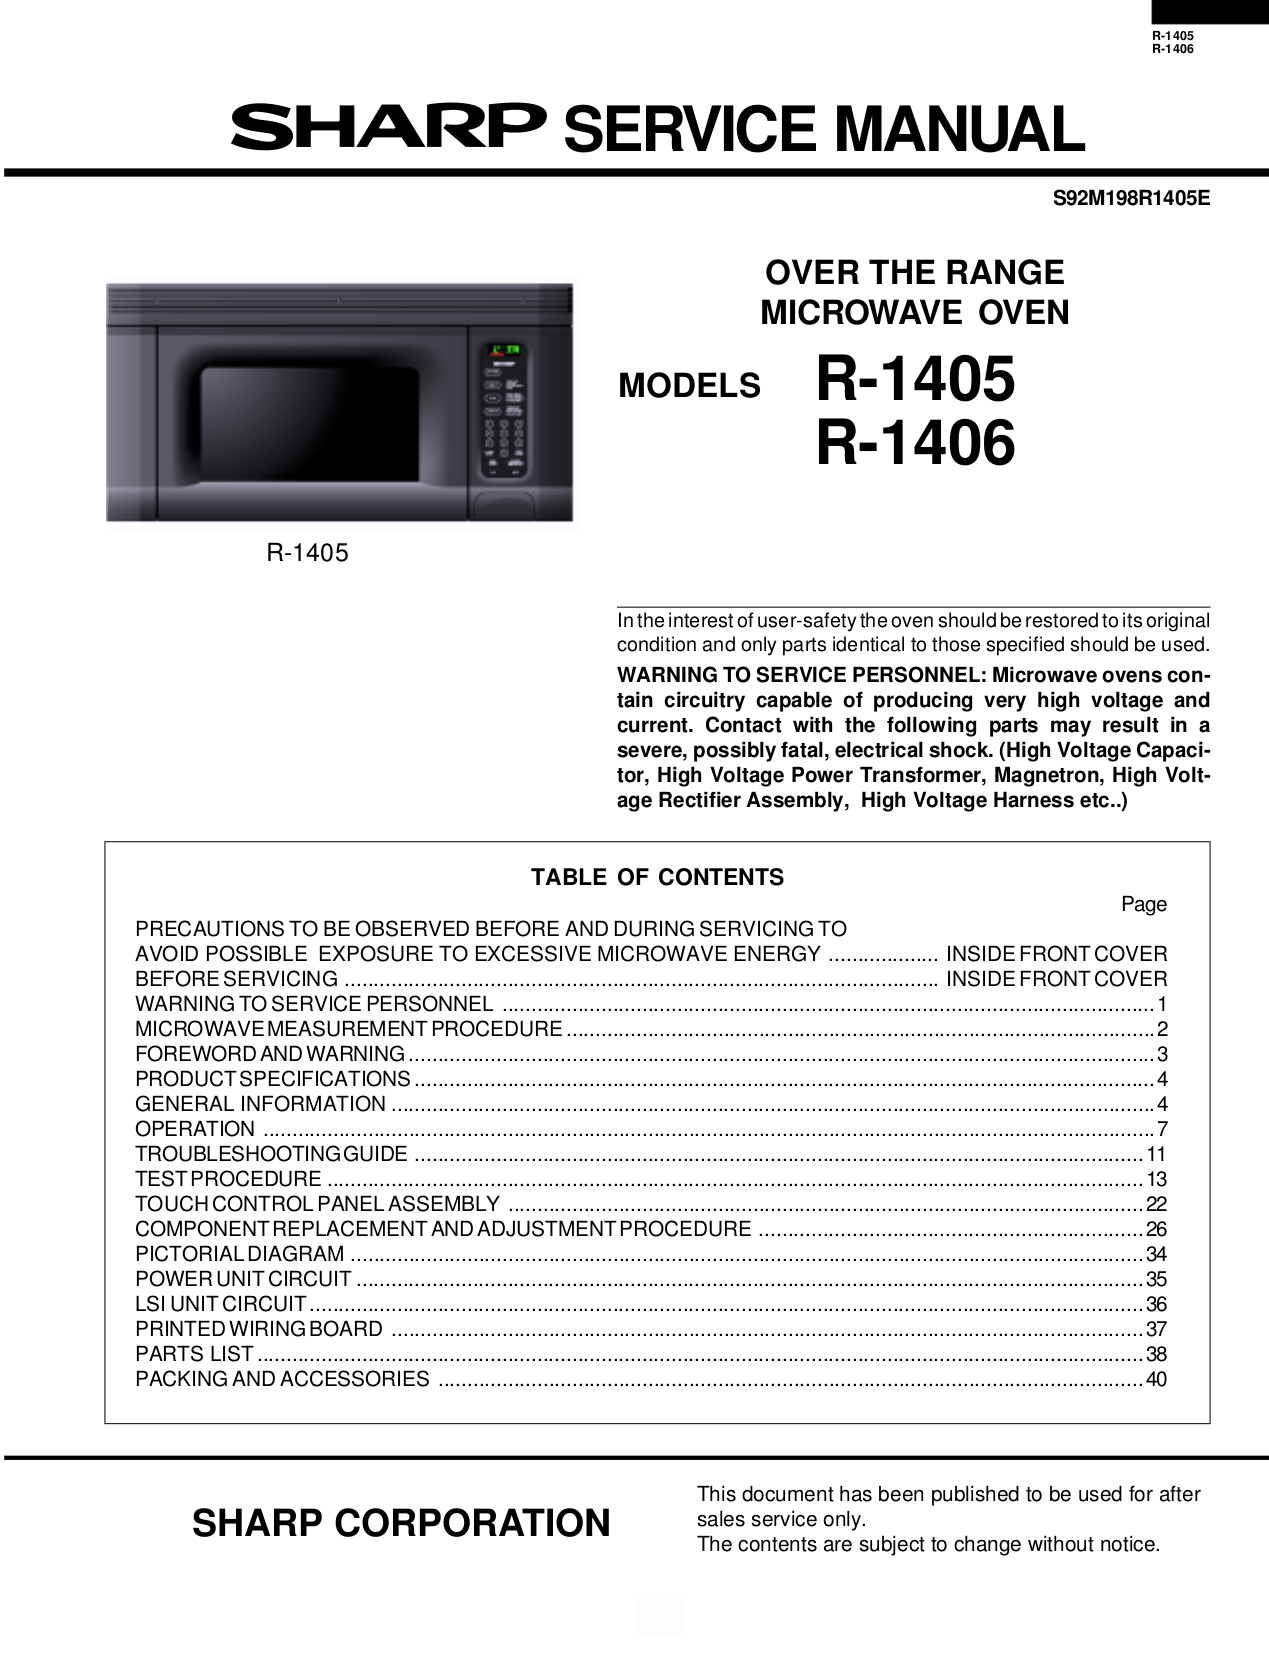 Pdf For Sharp Microwave R 1405 Manual